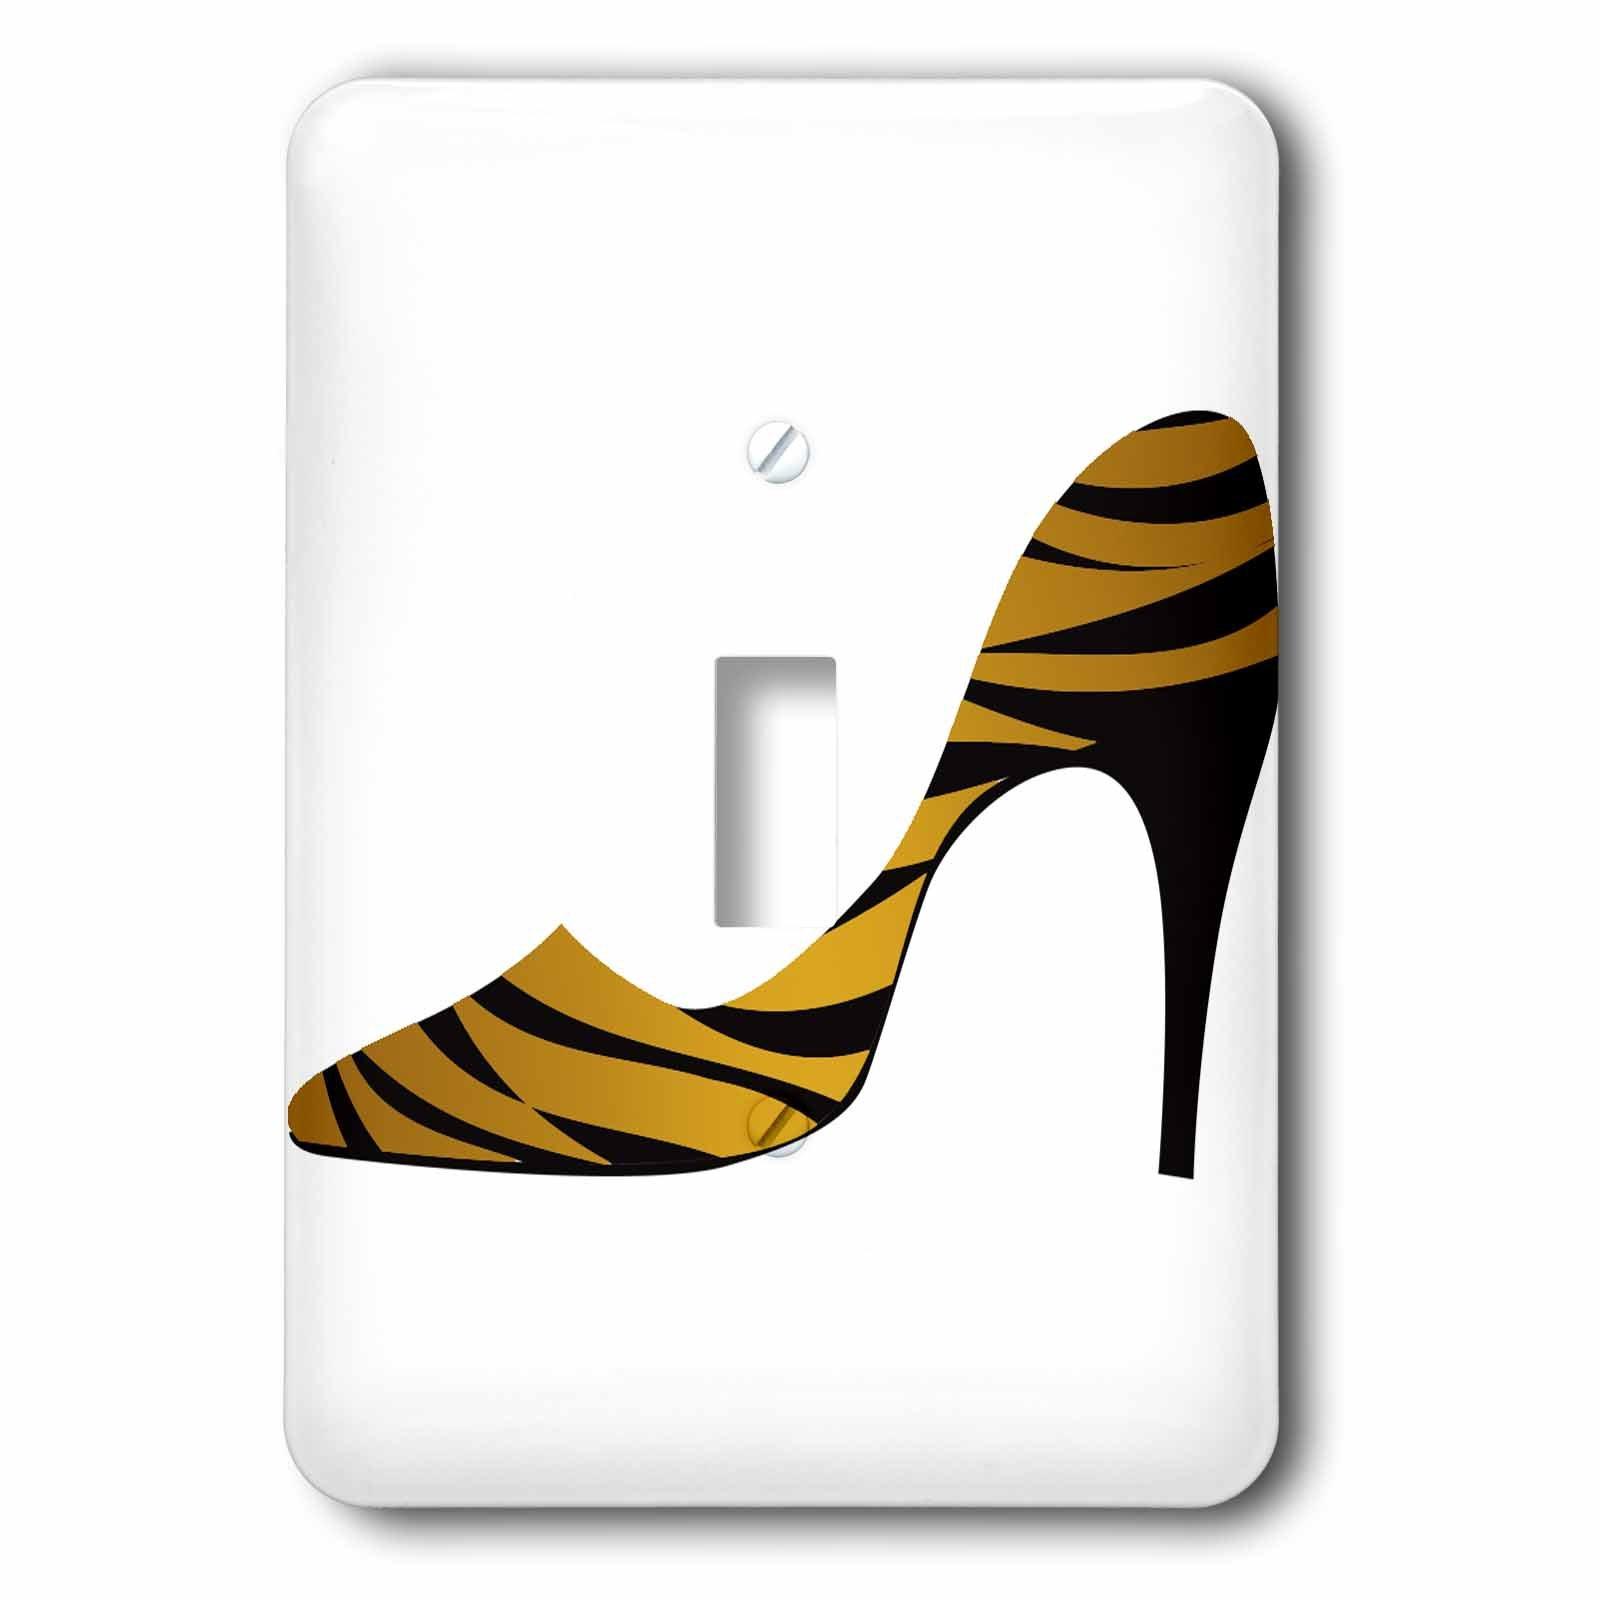 3D Rose lsp_211081_1 Gold Zebra Stripped Ladies High Heel Shoe-Single Toggle Switch, Black